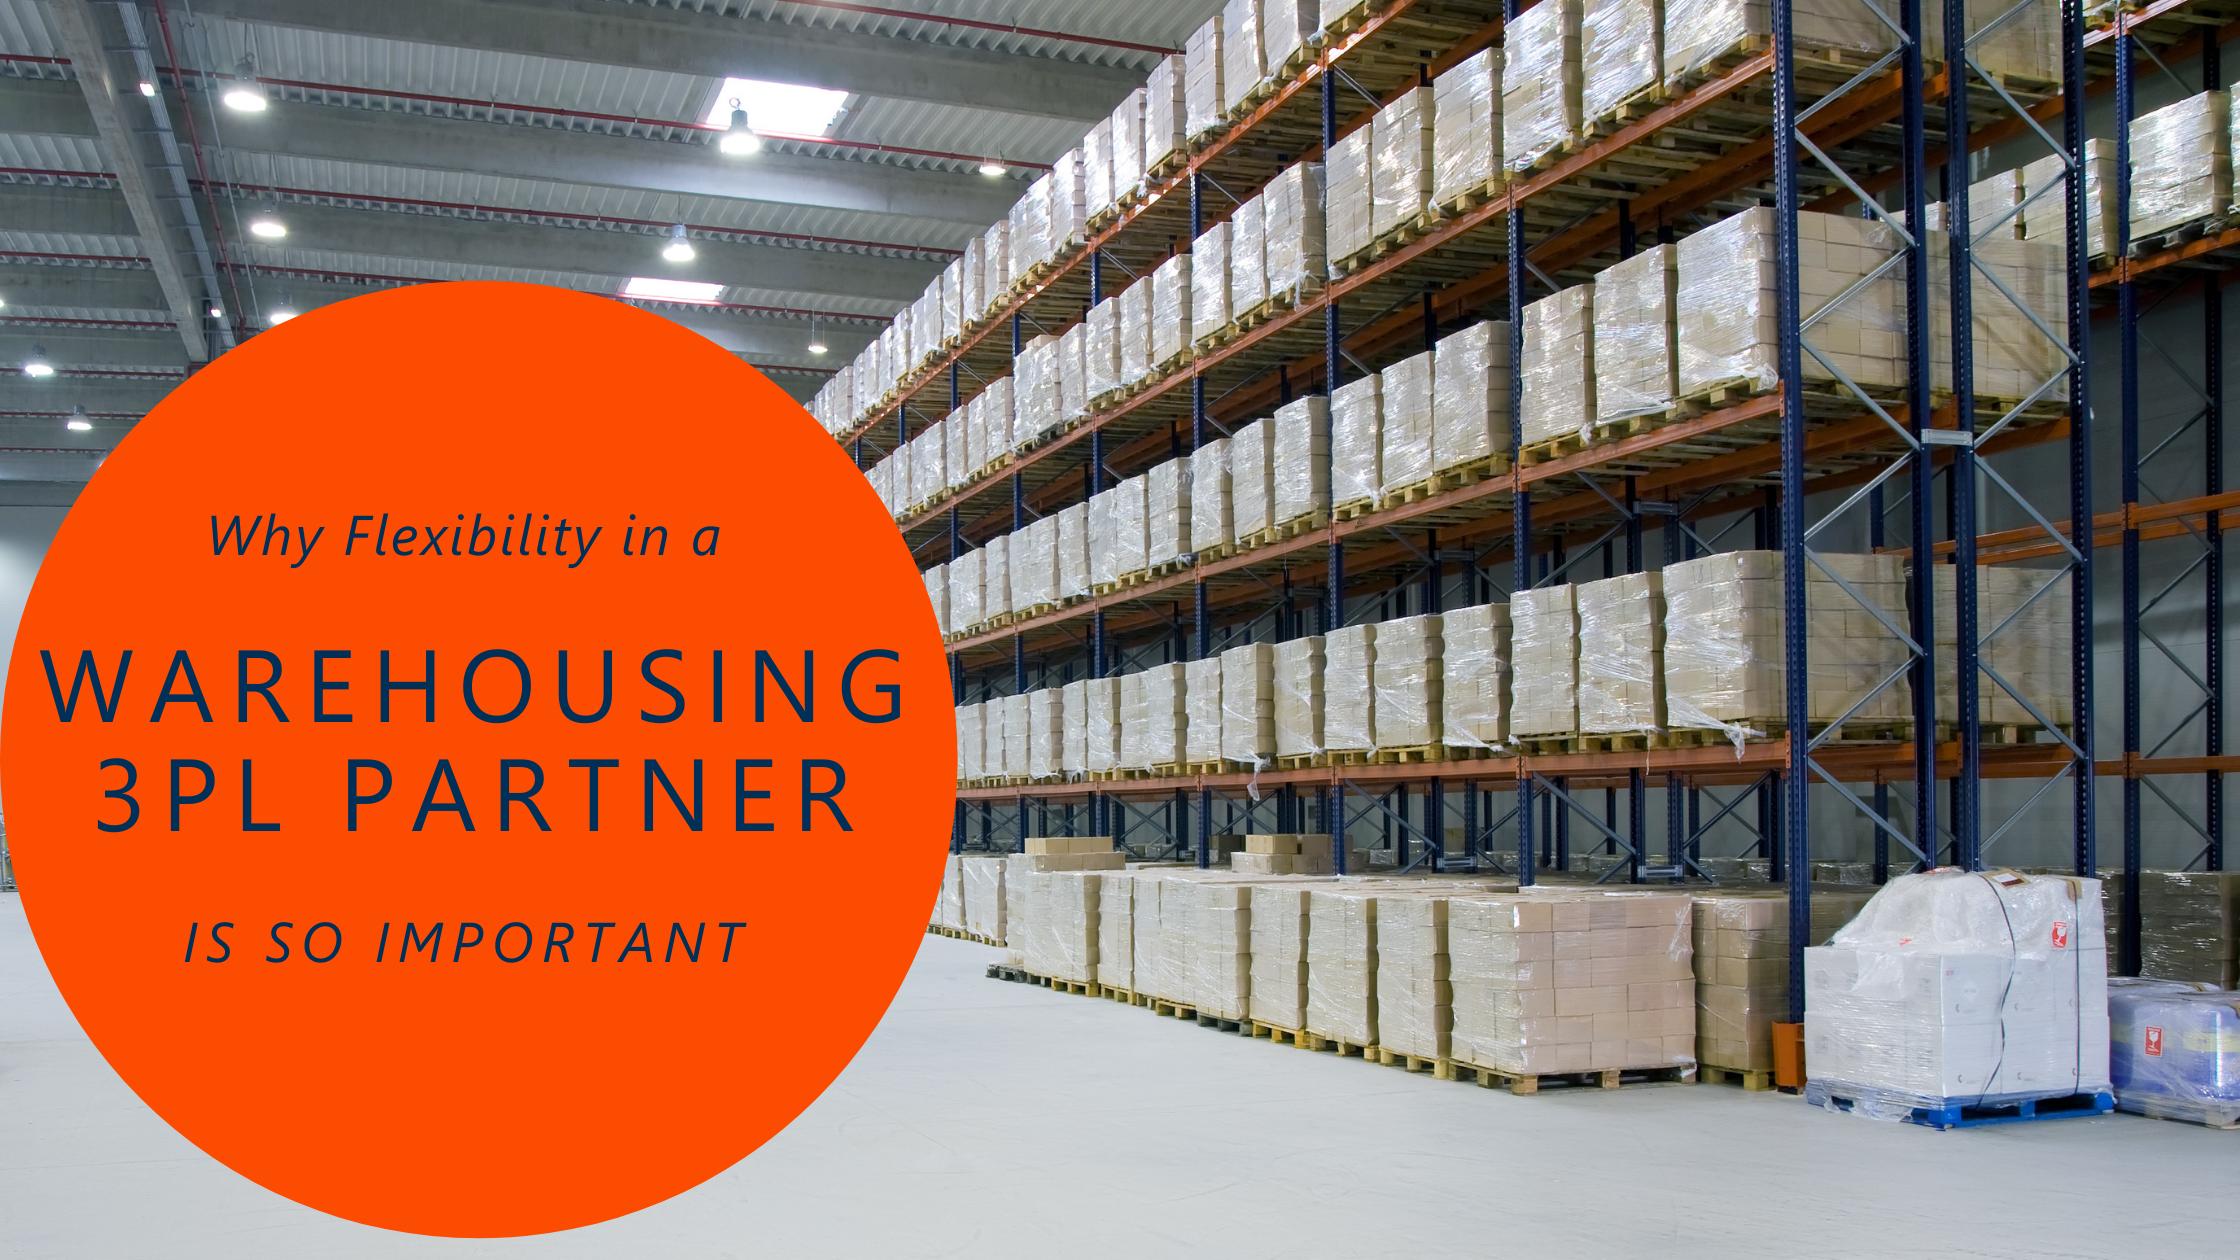 Warehousing 3PL partner